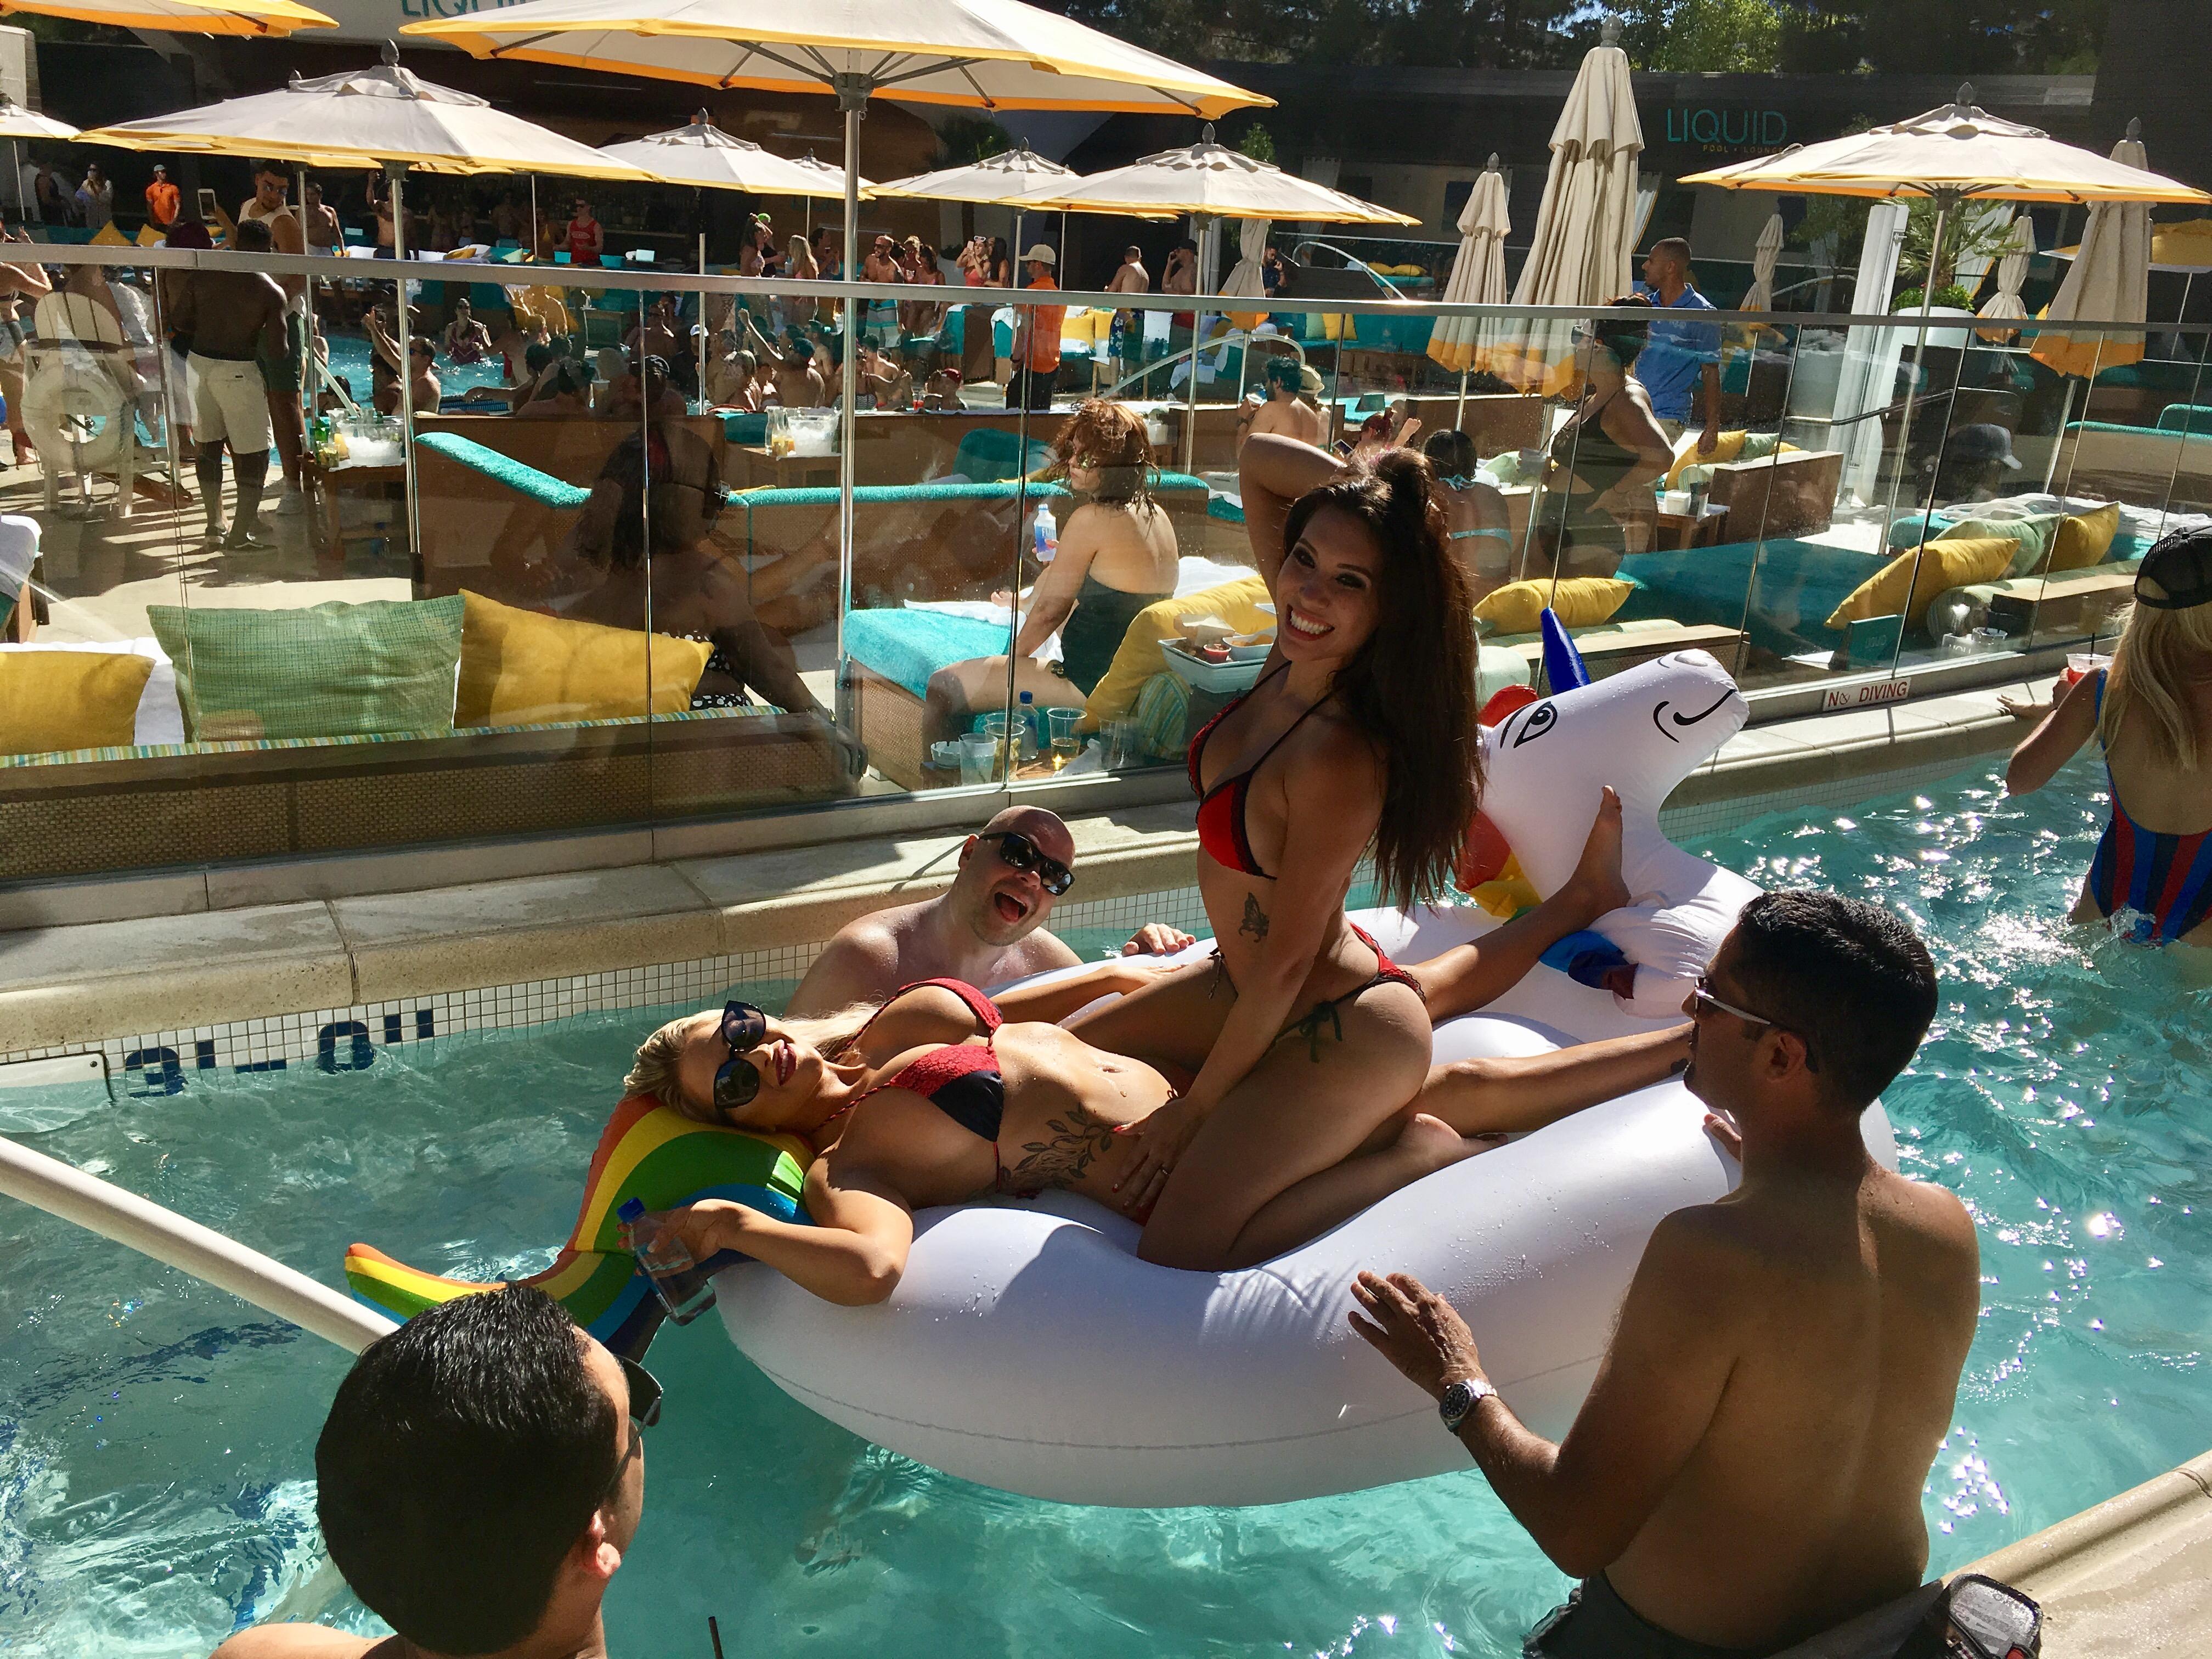 Liquid Pool Cabana